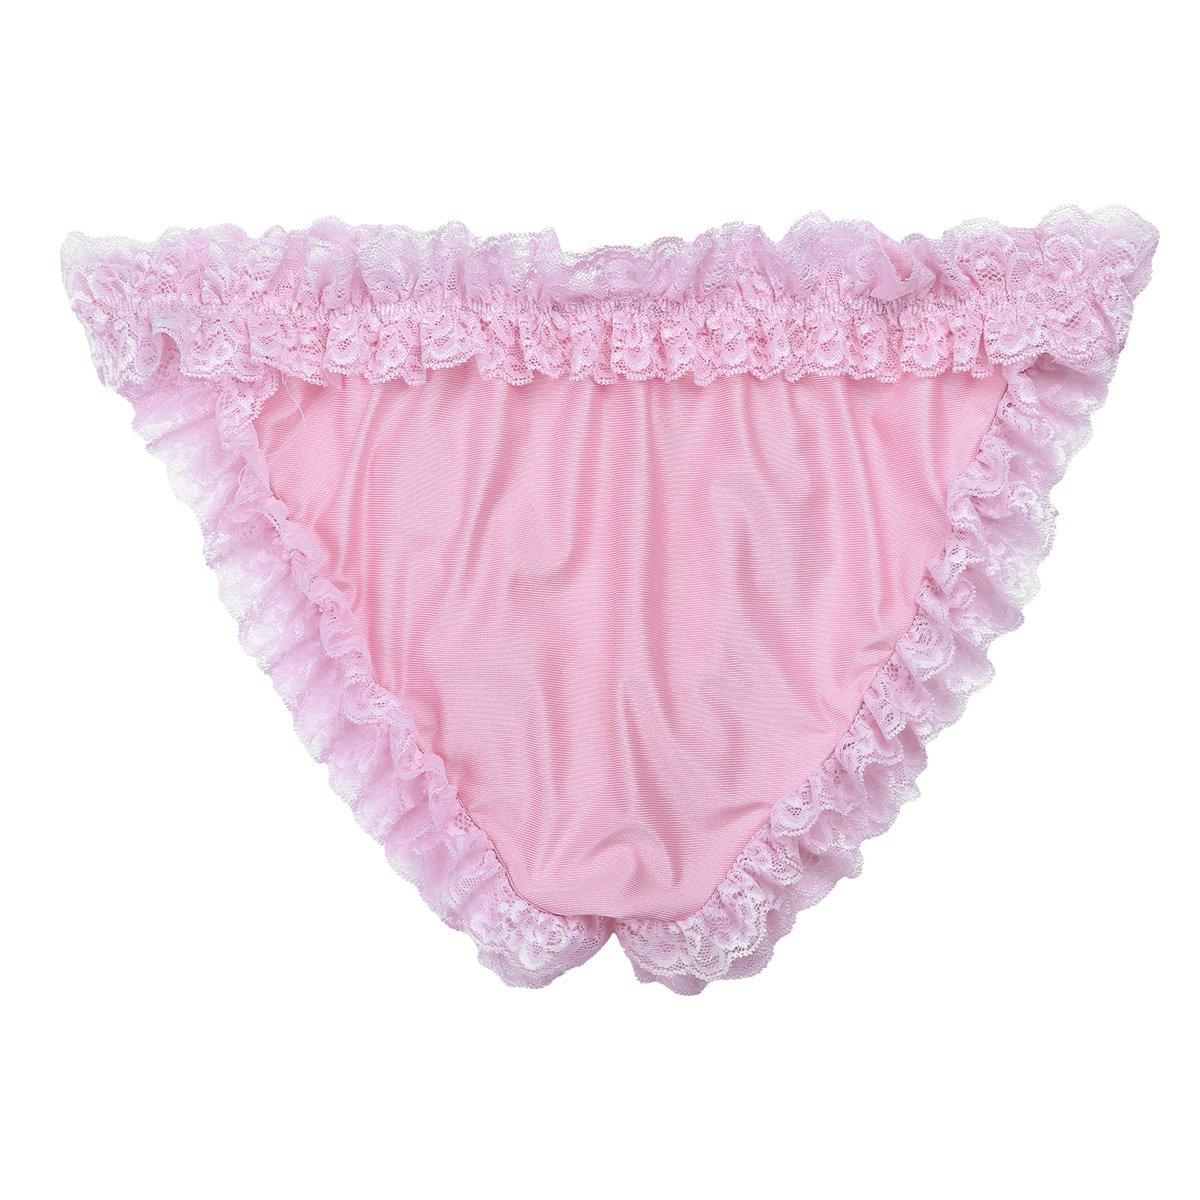 2017471fc16 FEESHOW Men's Bowknot Sissy Maid Floral Lace Bikini Briefs Low Waist Panties  Underwear Pink Medium (Waist 28.0-53.5